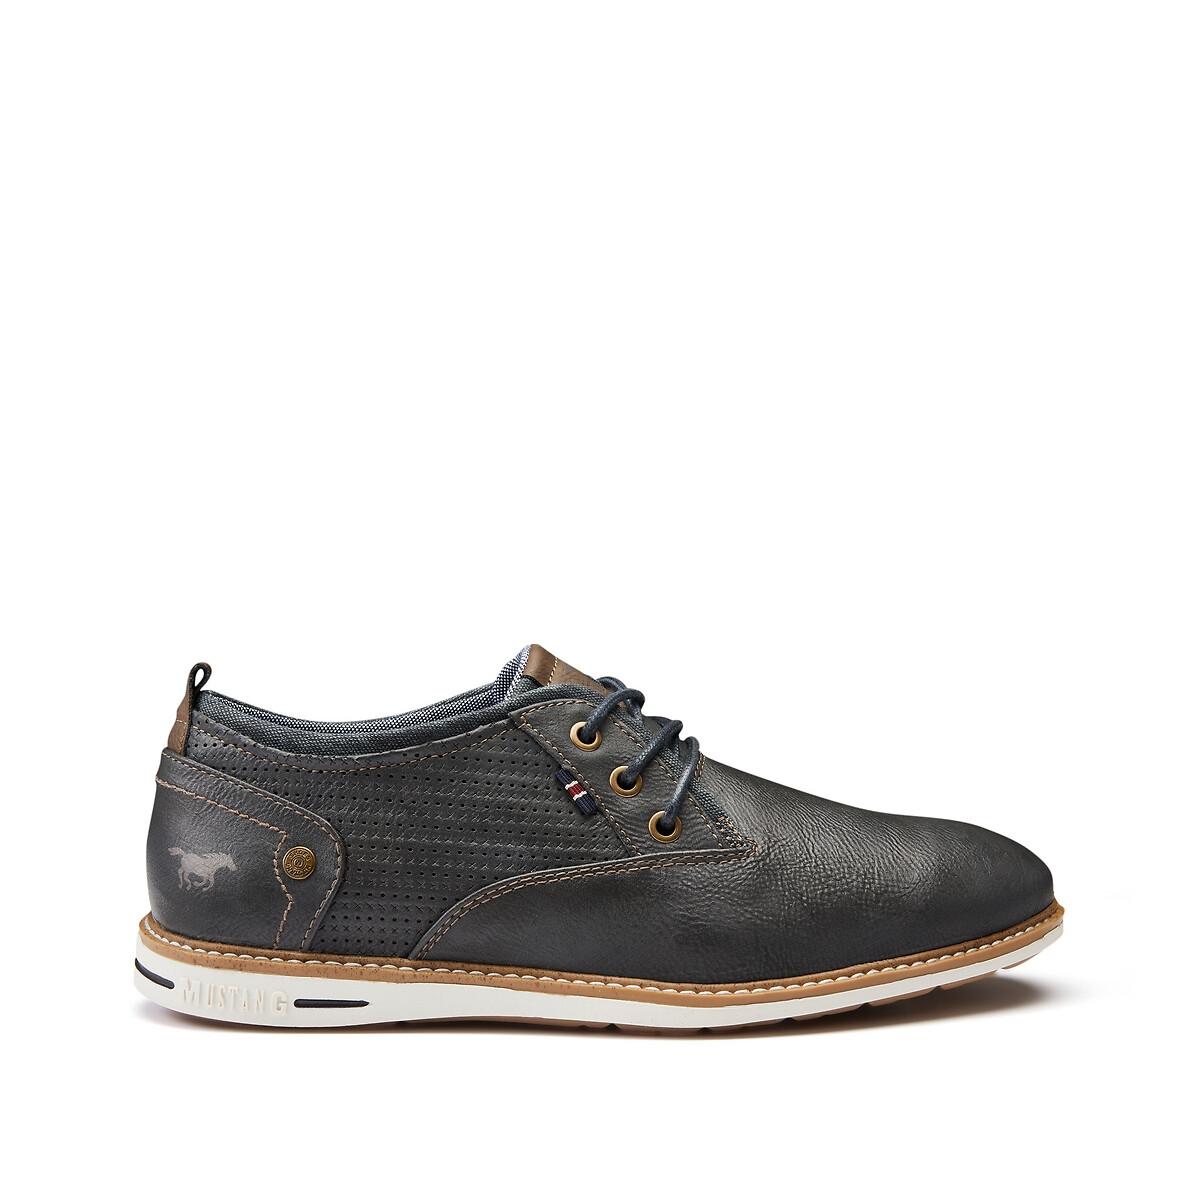 цена Ботинки-дерби La Redoute На шнуровке 44 серый онлайн в 2017 году